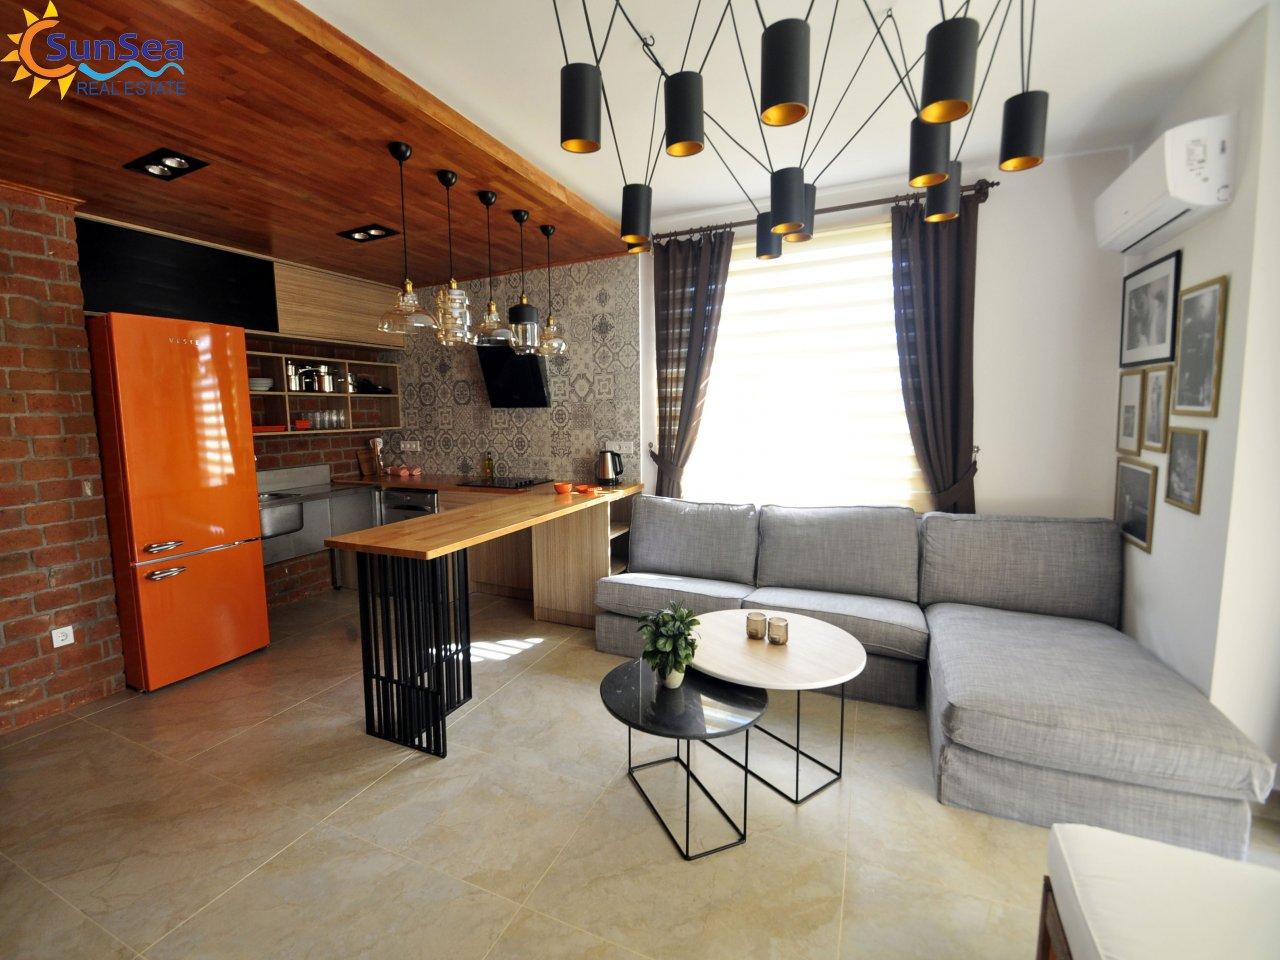 alanya fortuna resort livingroom